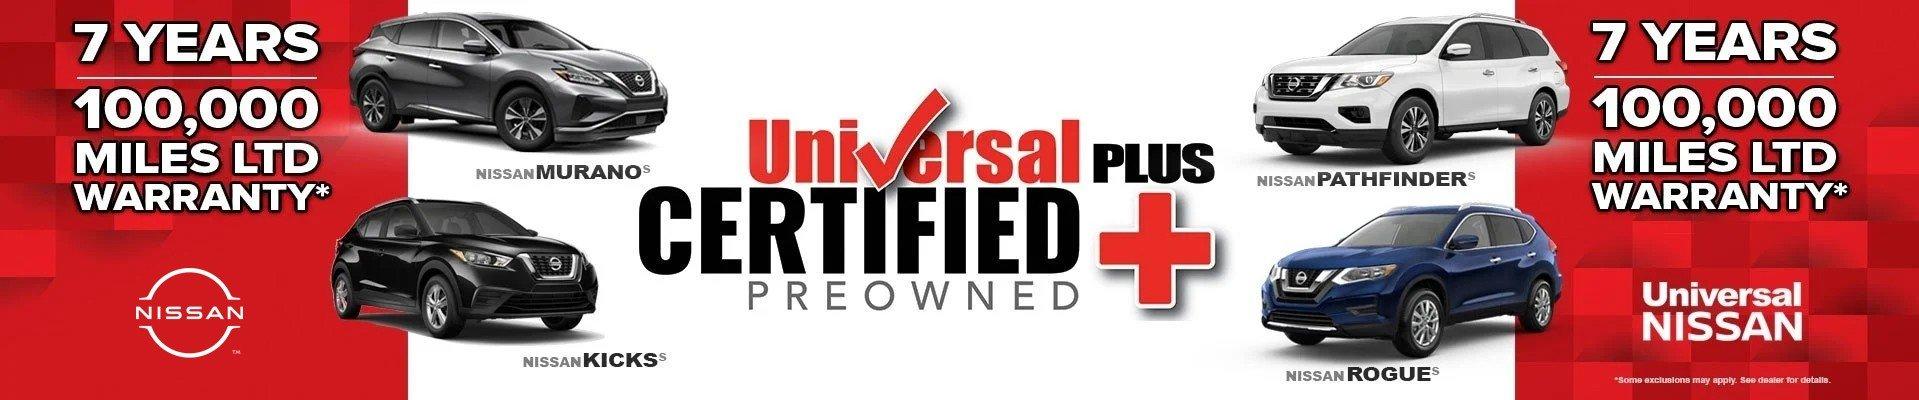 Universal Nissan CPO